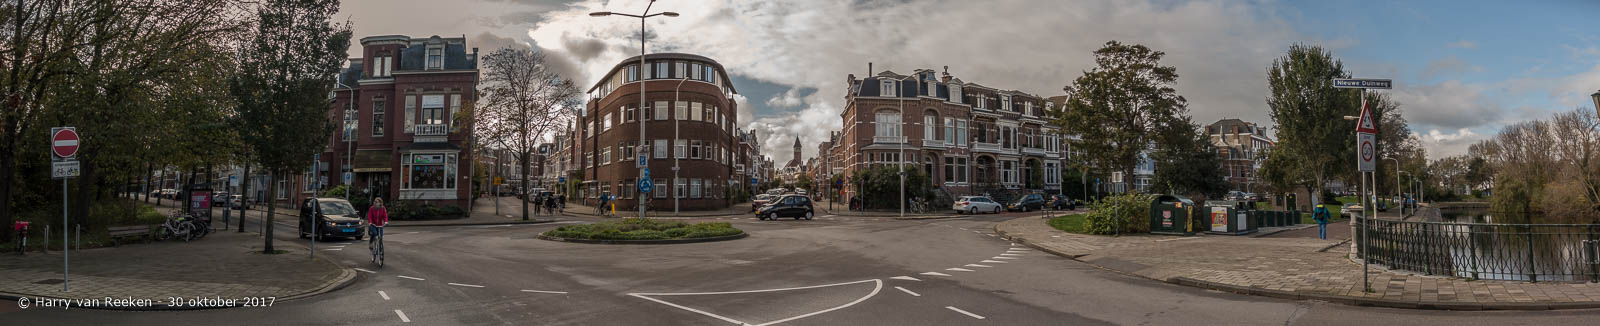 Jolstr-Pansierstr-Scheveningen - pano-01-Pano